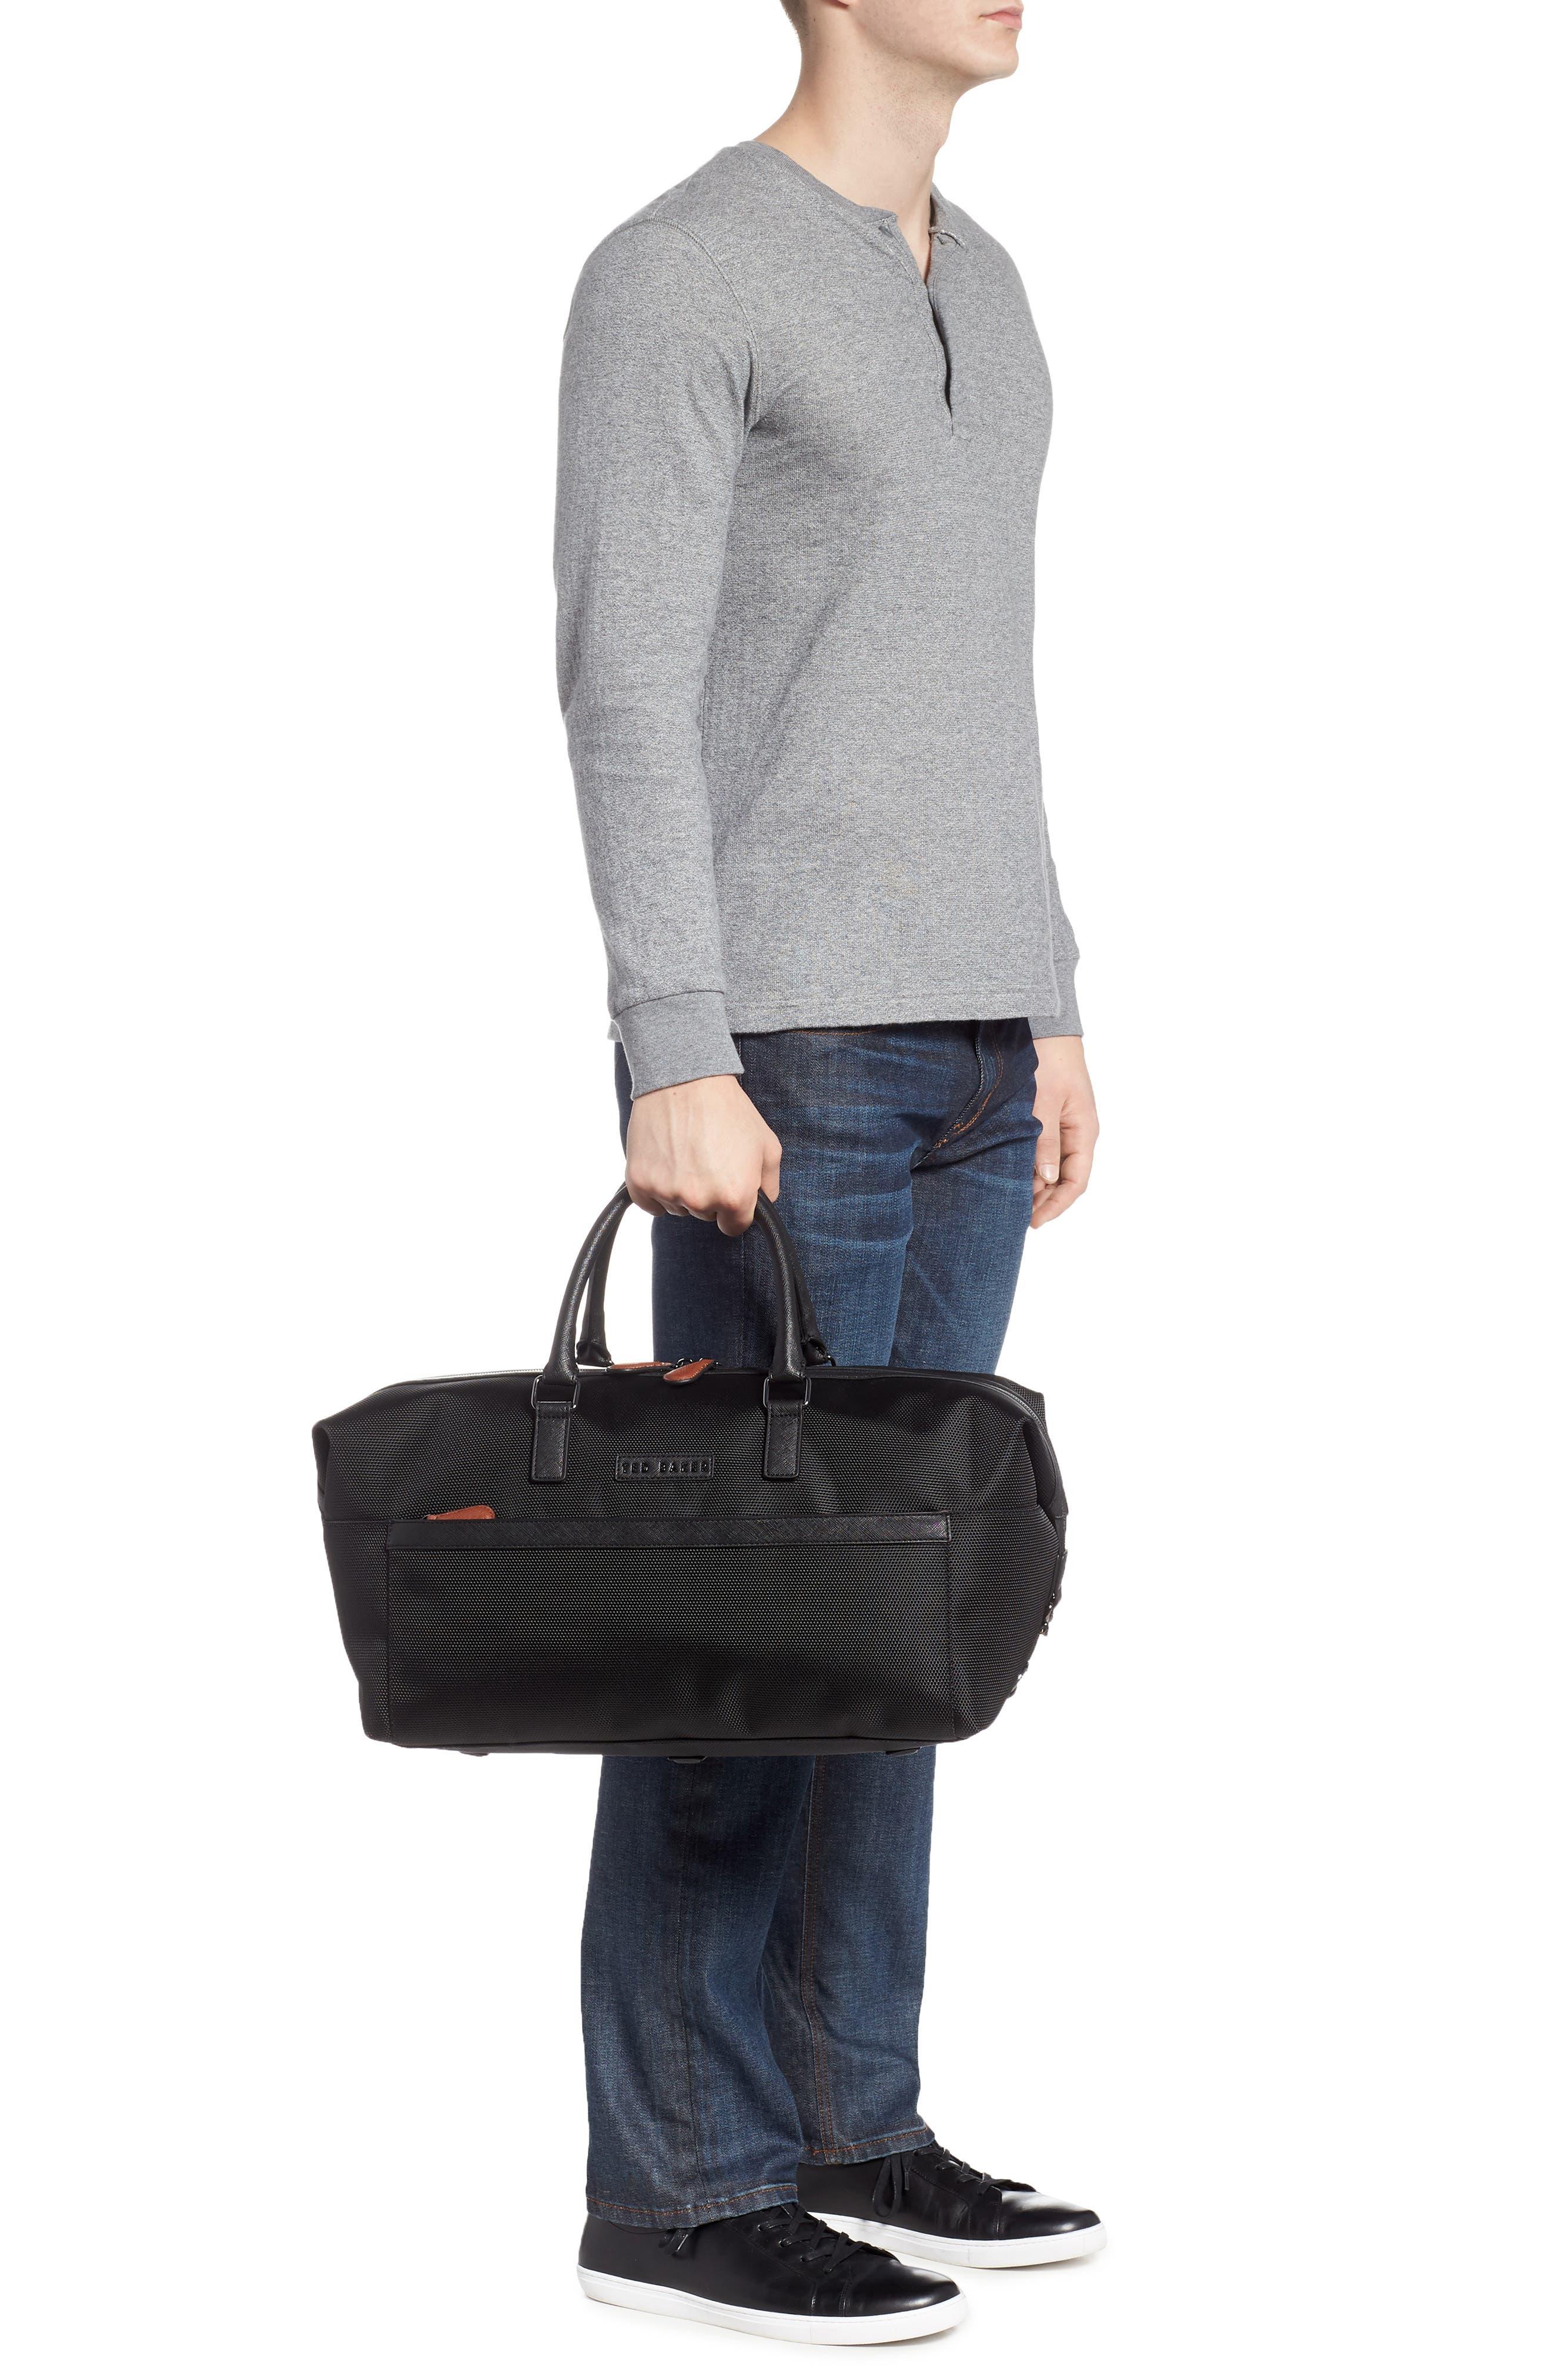 Smart Duffel Bag,                             Alternate thumbnail 2, color,                             Black